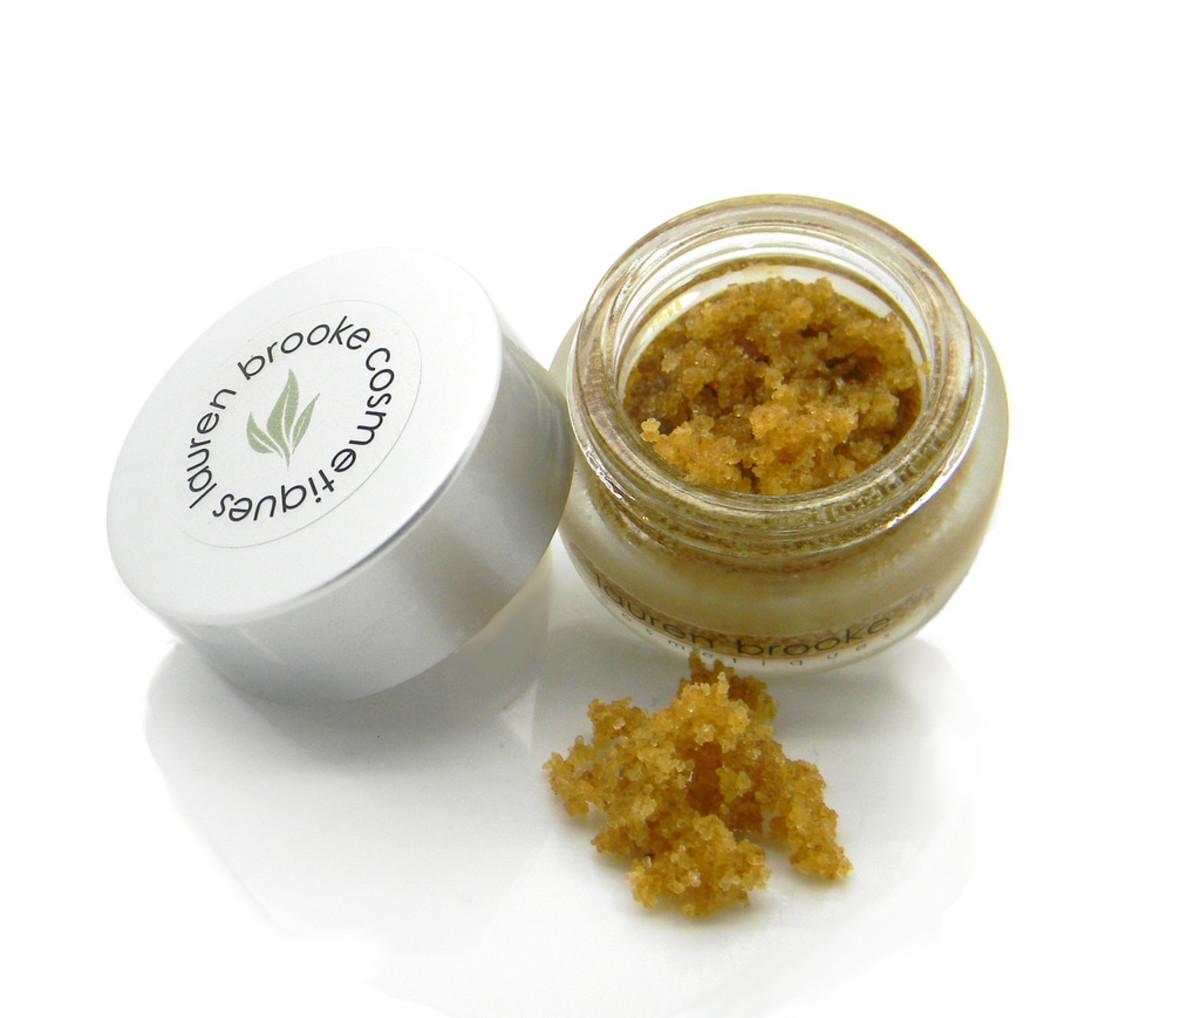 Lauren Brooke Organic Sweet Chai Lip Scrub